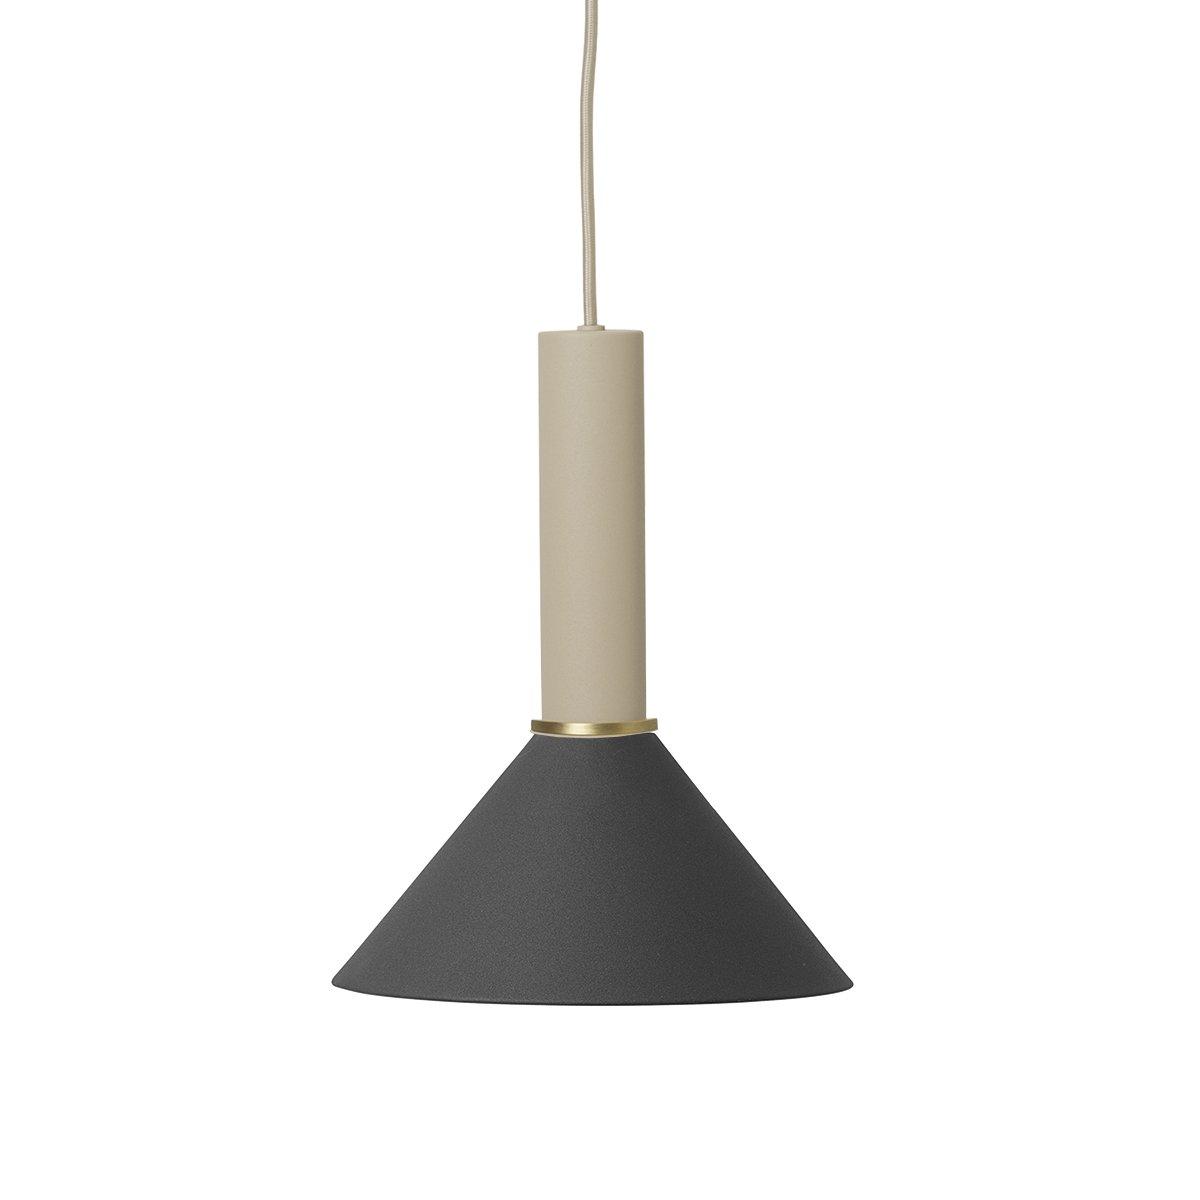 Ferm Living Collect Cone Zwart High Hanglamp - Cashmere